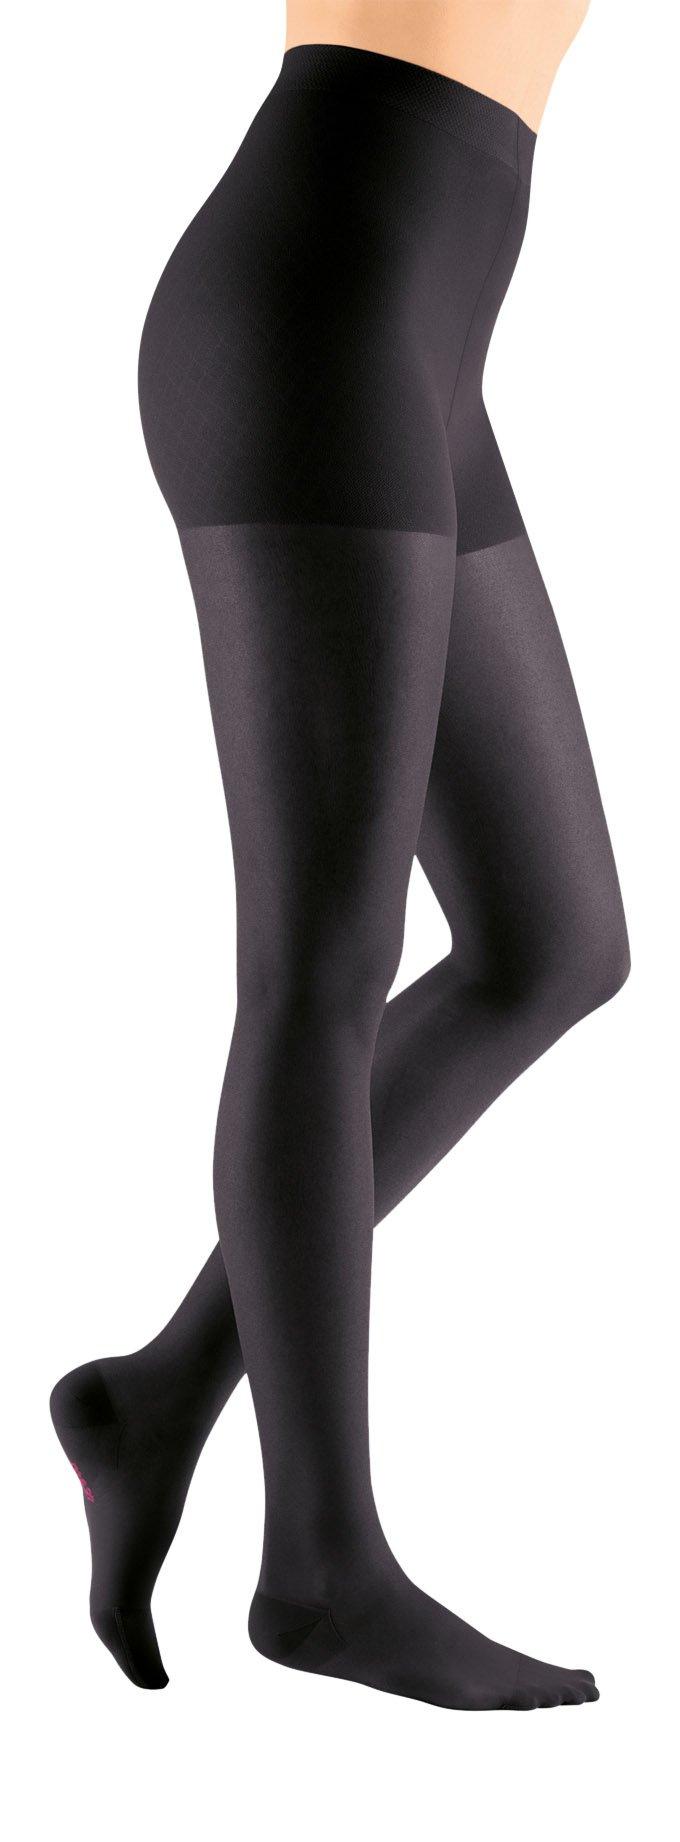 mediven sheer & soft, 30-40 mmHg, Maternity Pantyhose, Closed Toe